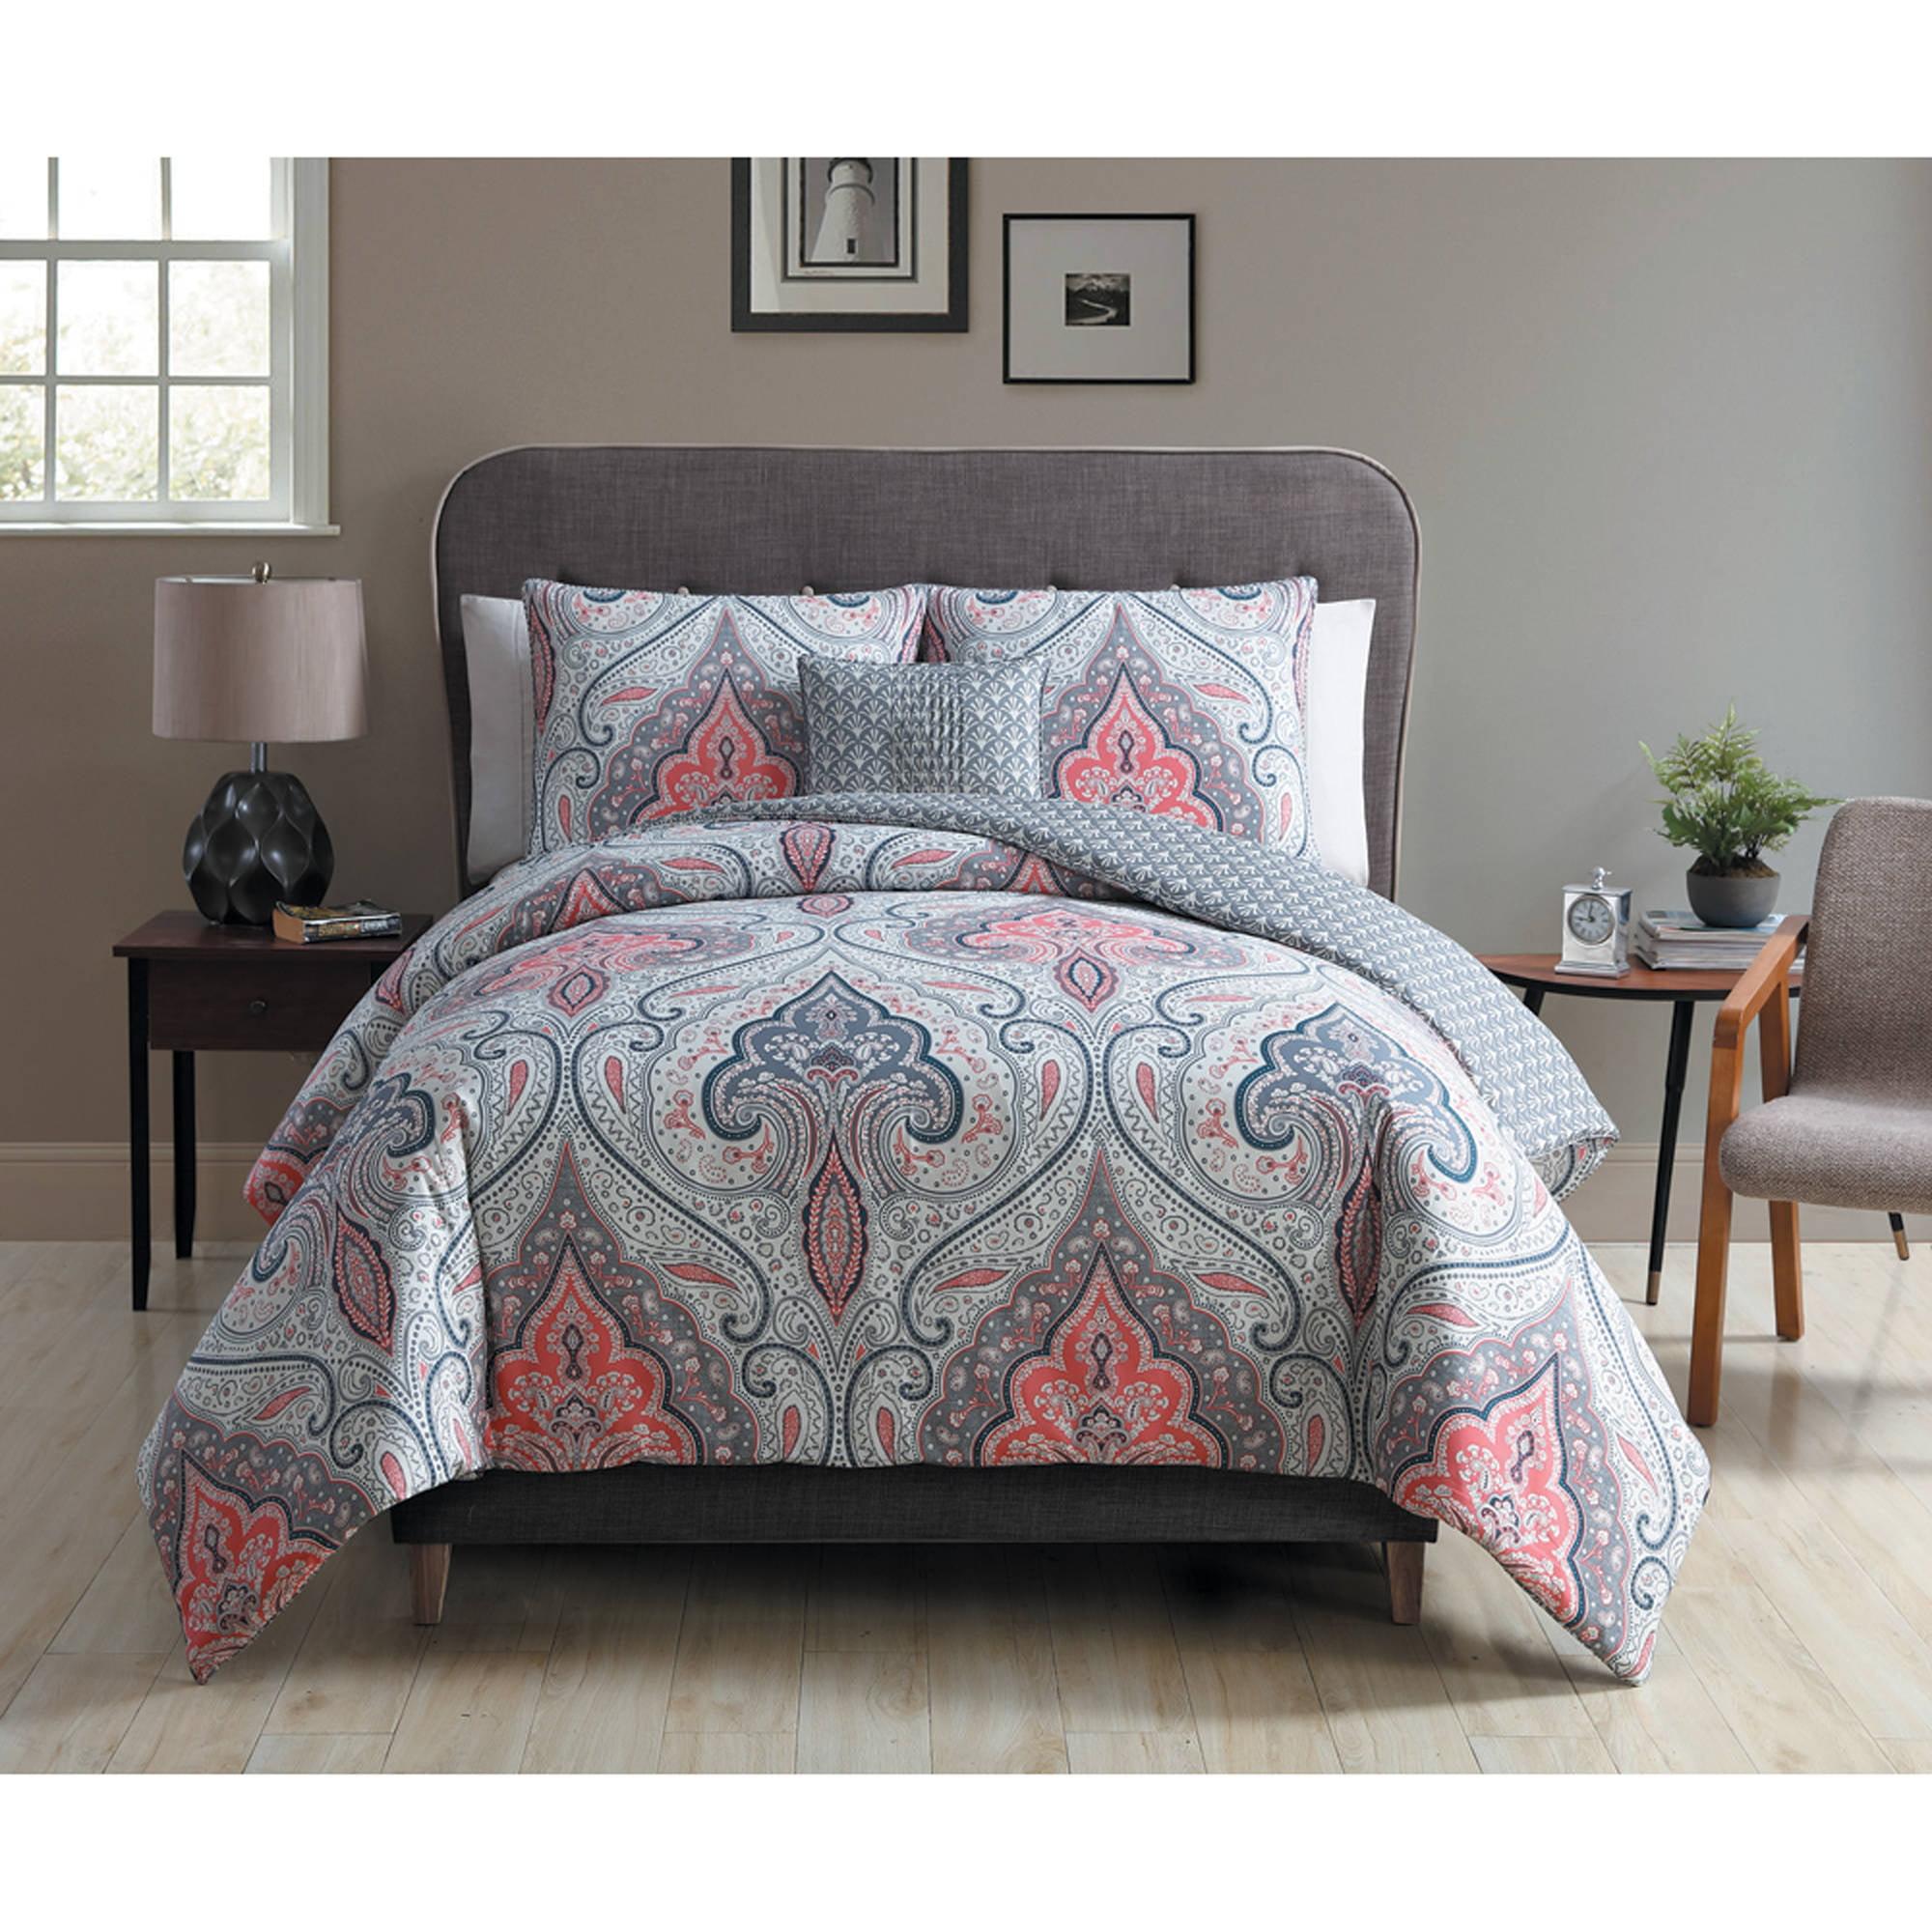 better homes and gardens gray medallion 4piece bedding duvet cover set